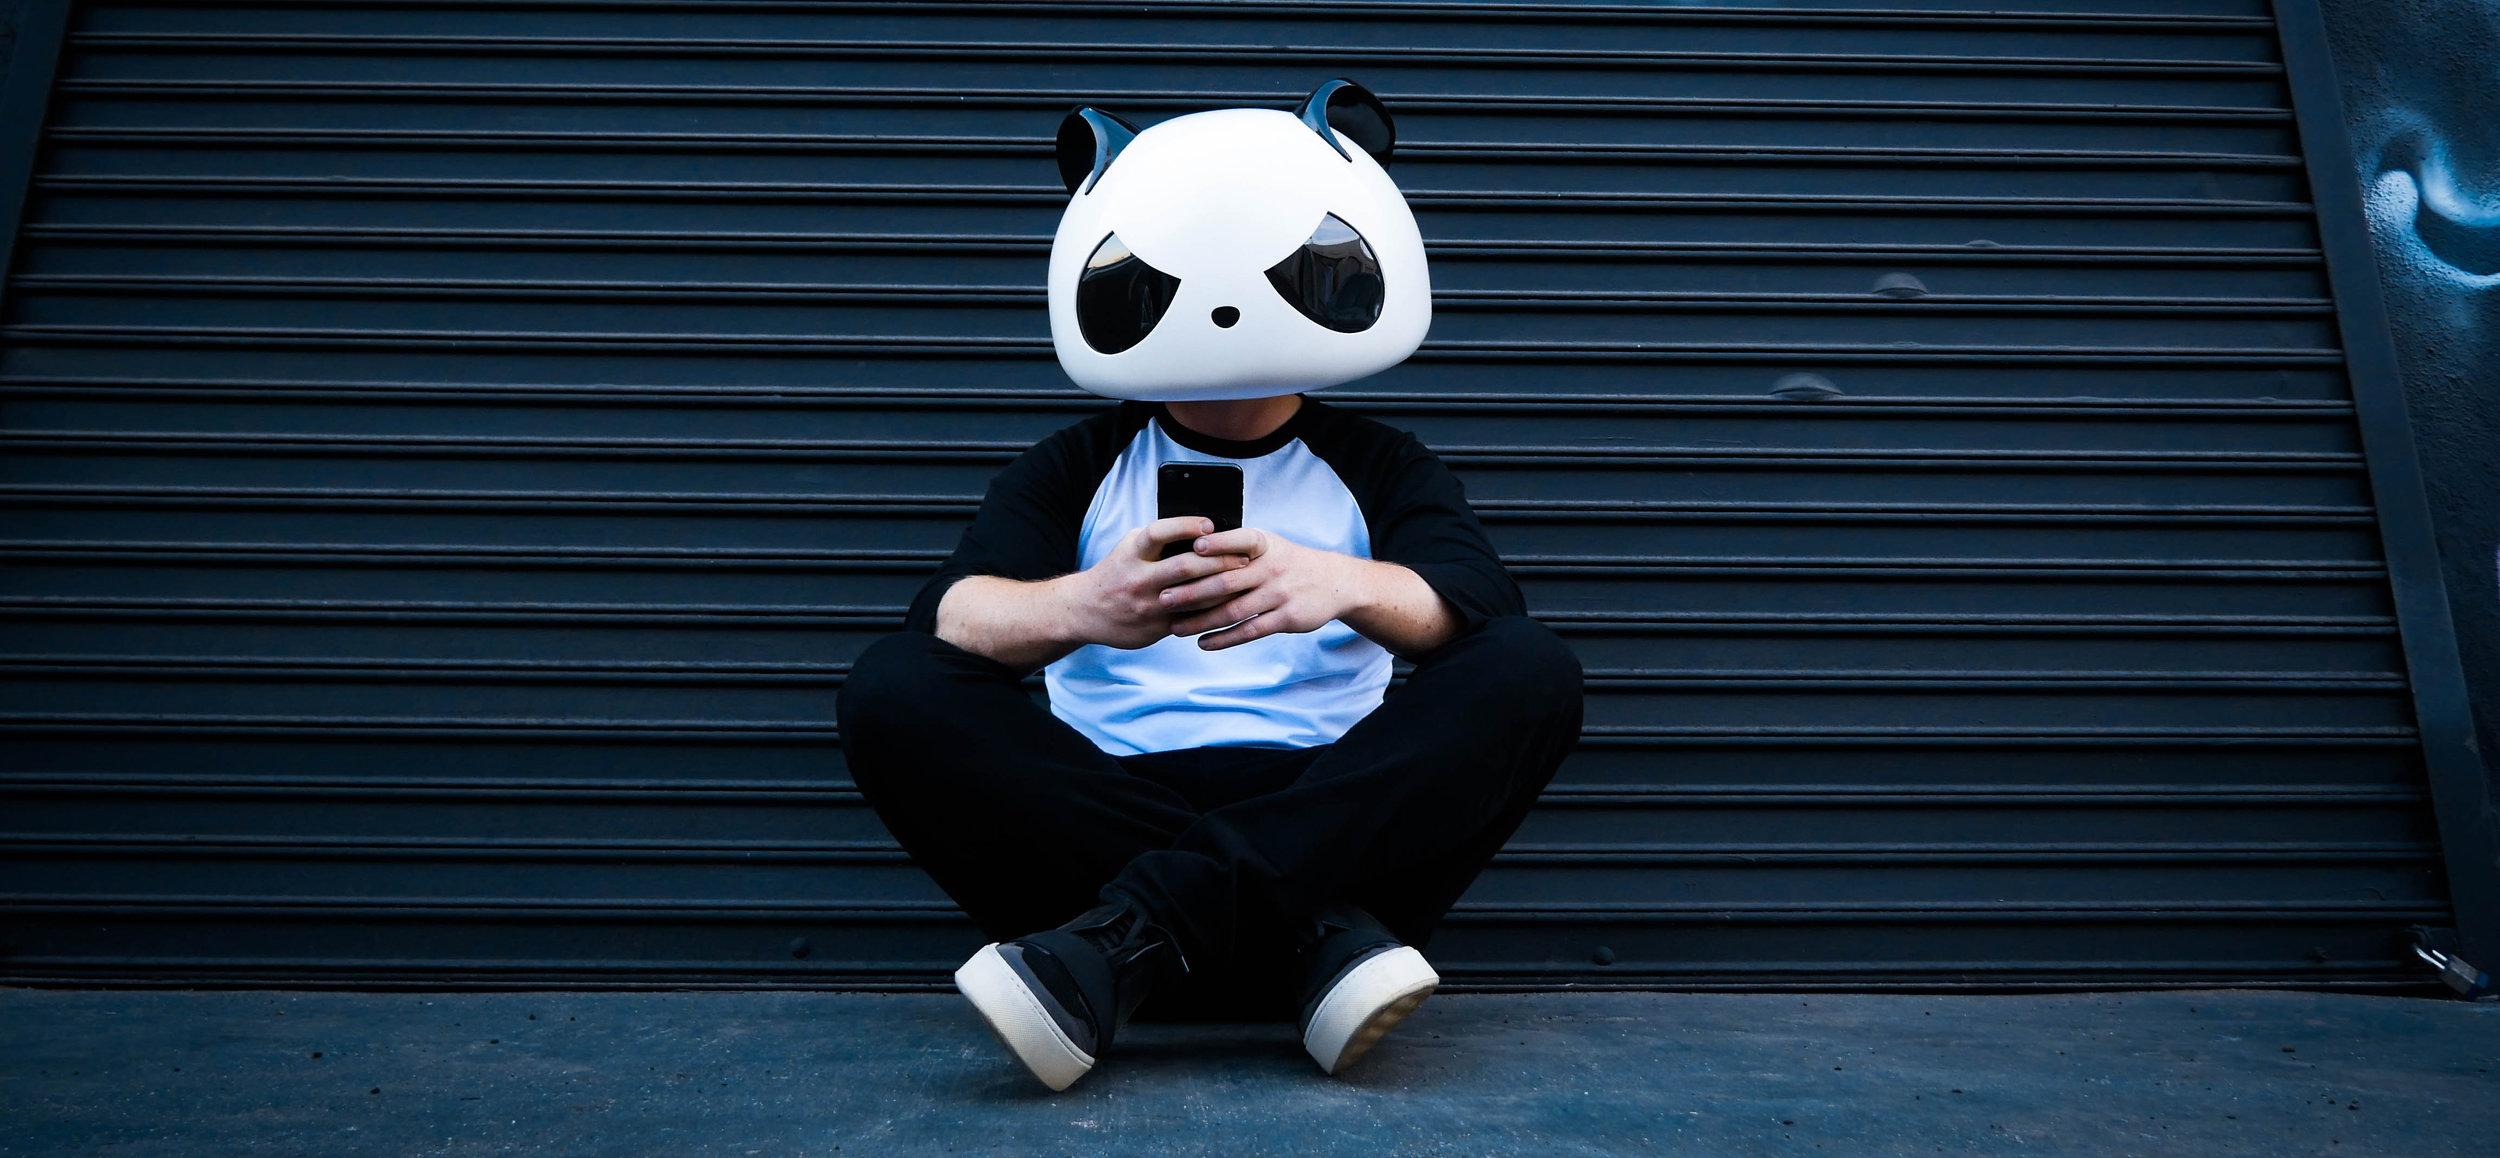 DJ White Panda